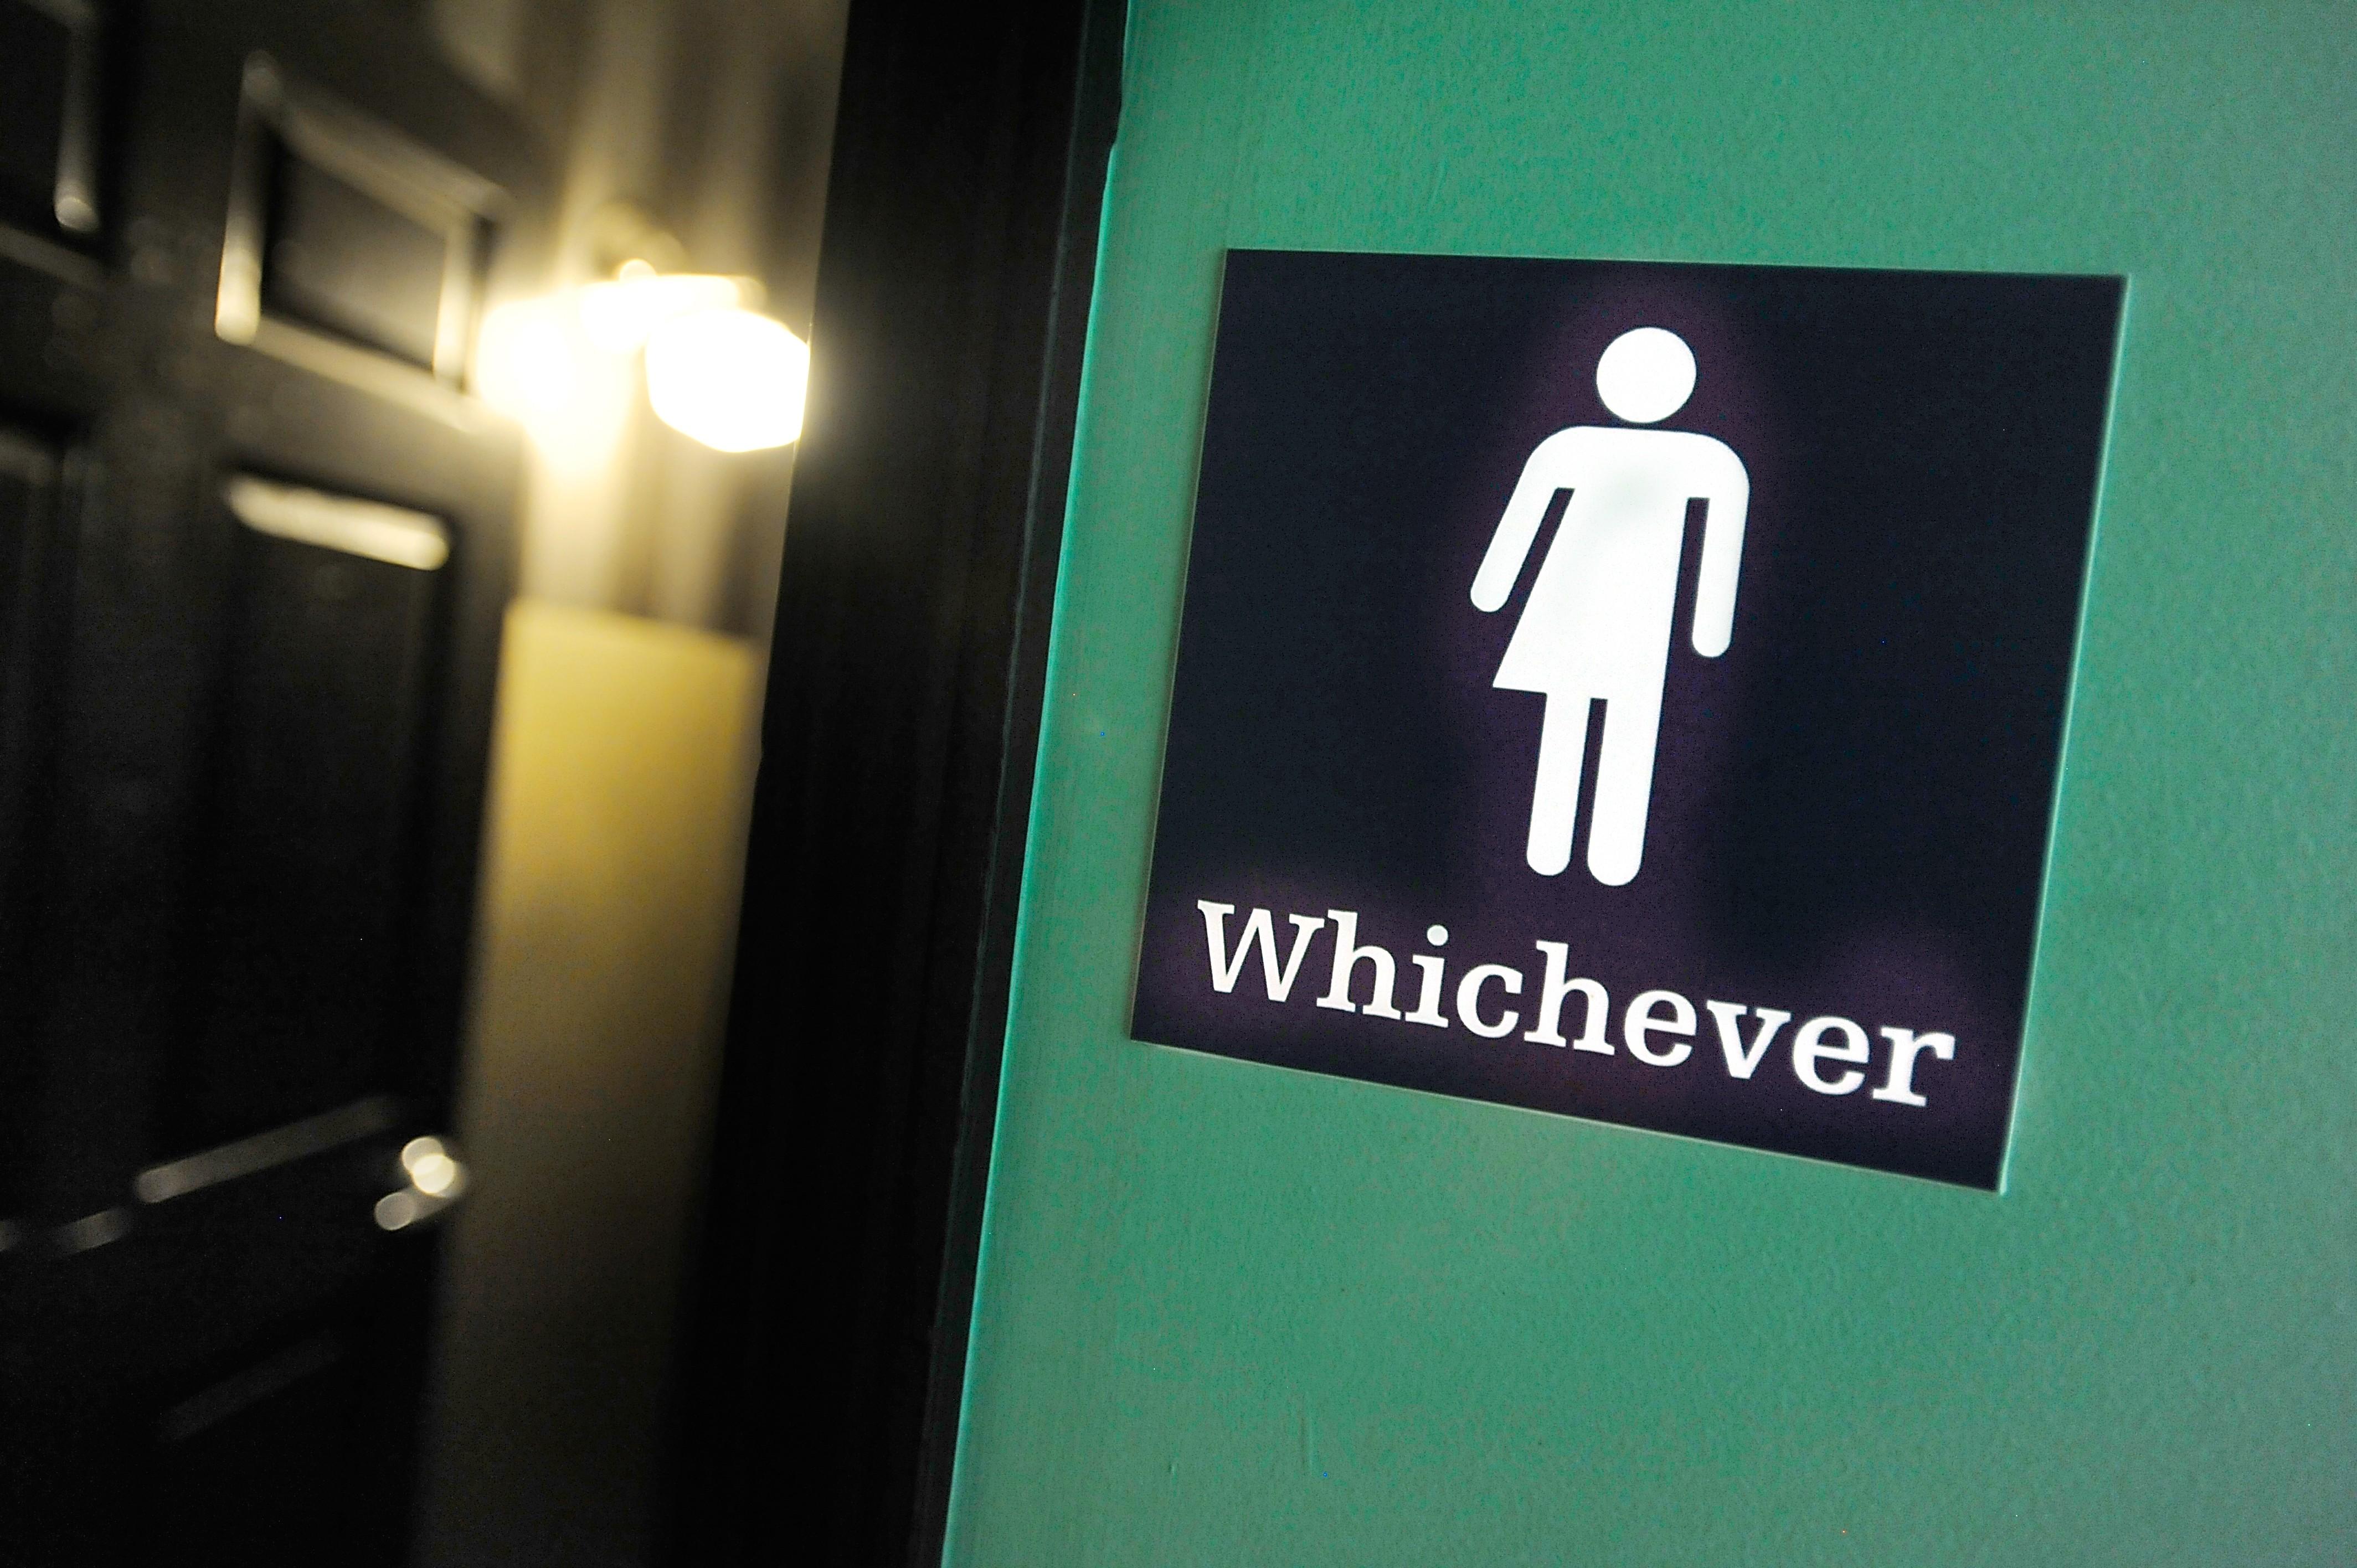 Transgender Bathroom Law Latest Transgender Bathroom Law Repealed In north Carolina Concept